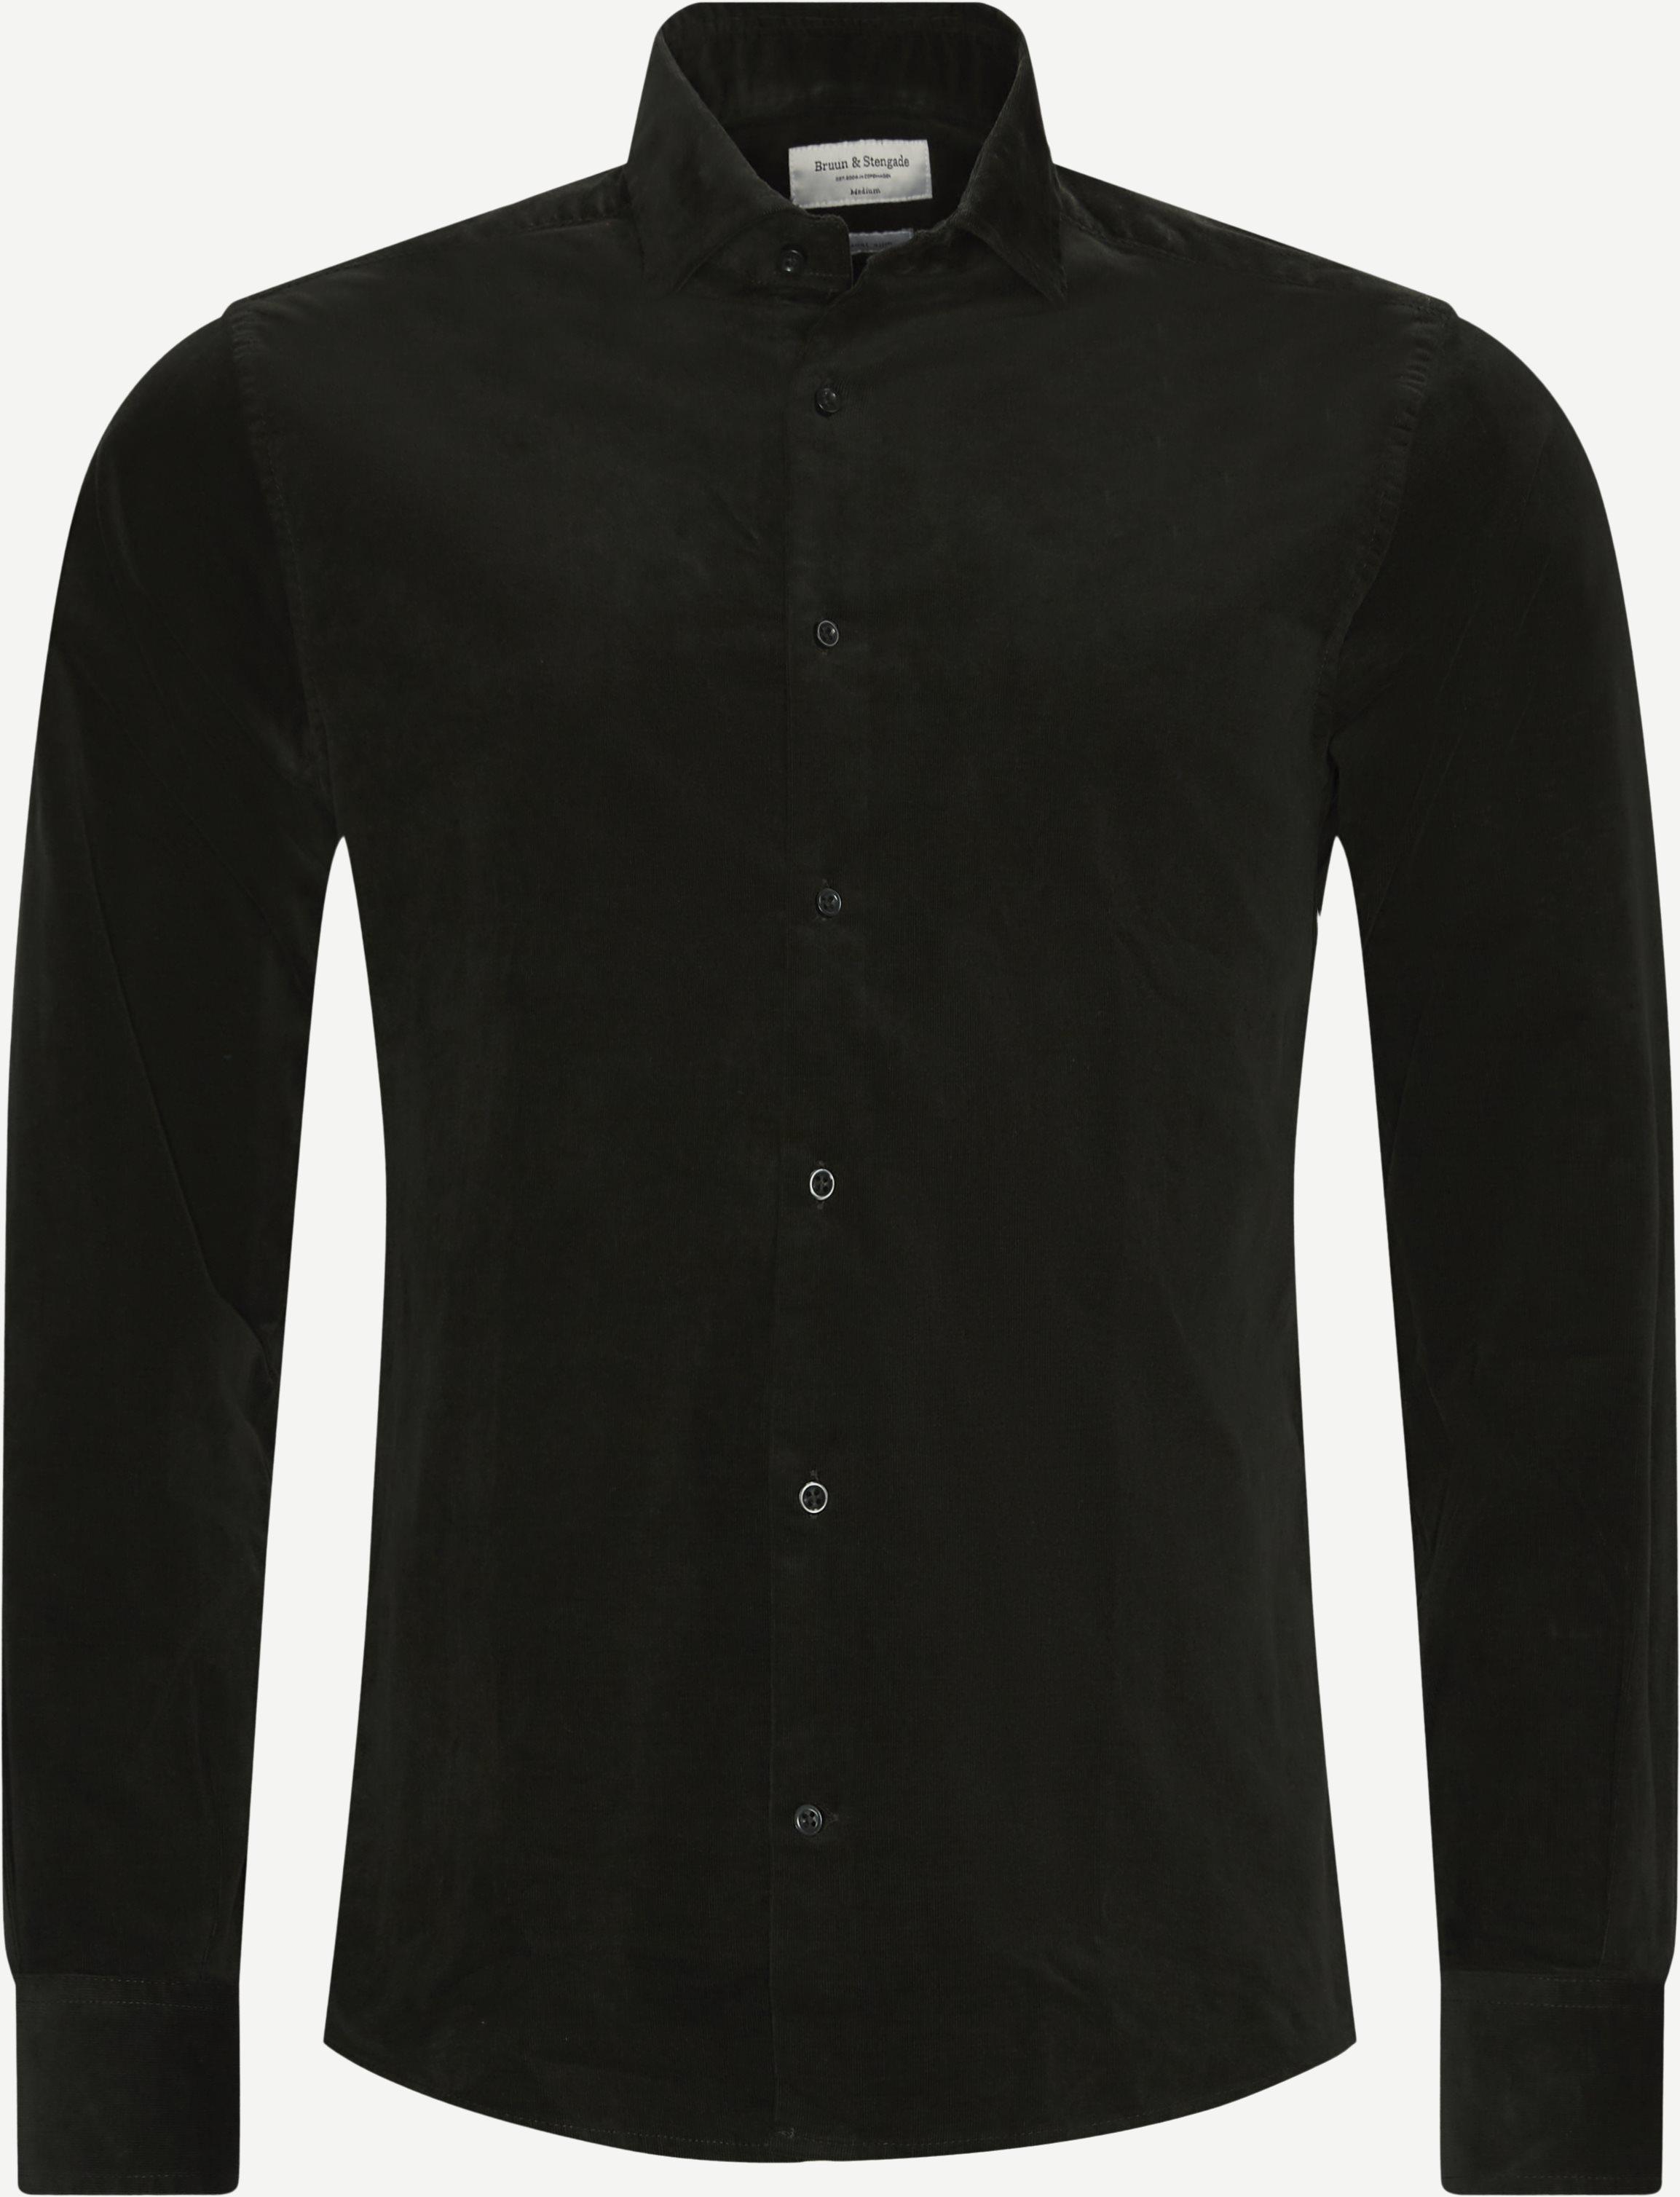 Kyoto Shirt - Skjorter - Regular slim fit - Grøn